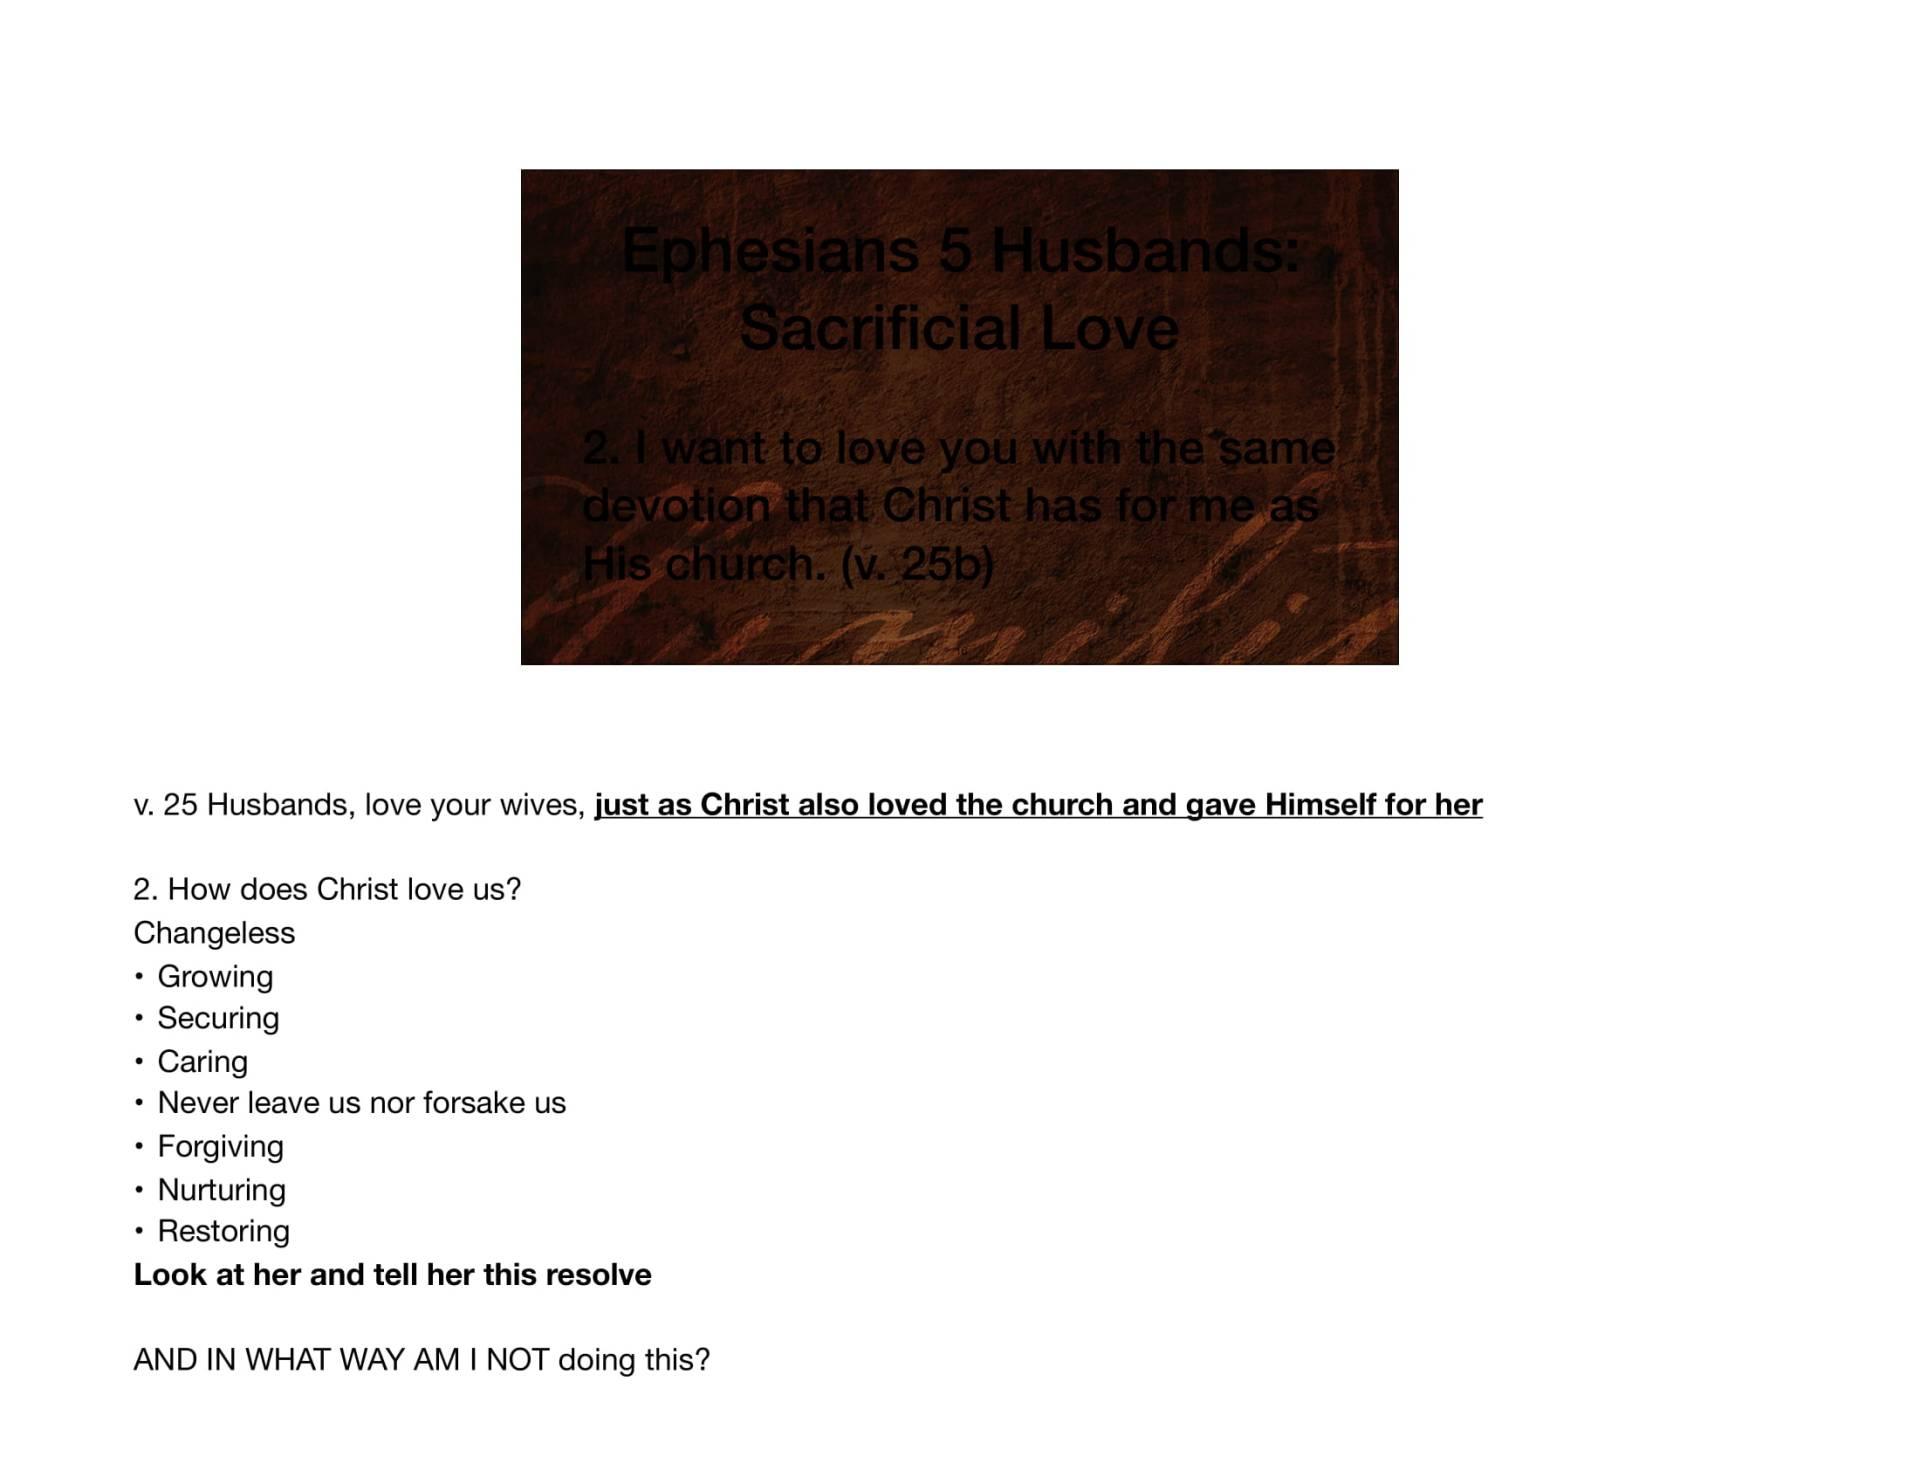 LGI-04 - Caution Men - Spiritual Maturity Is Not Automatic-16